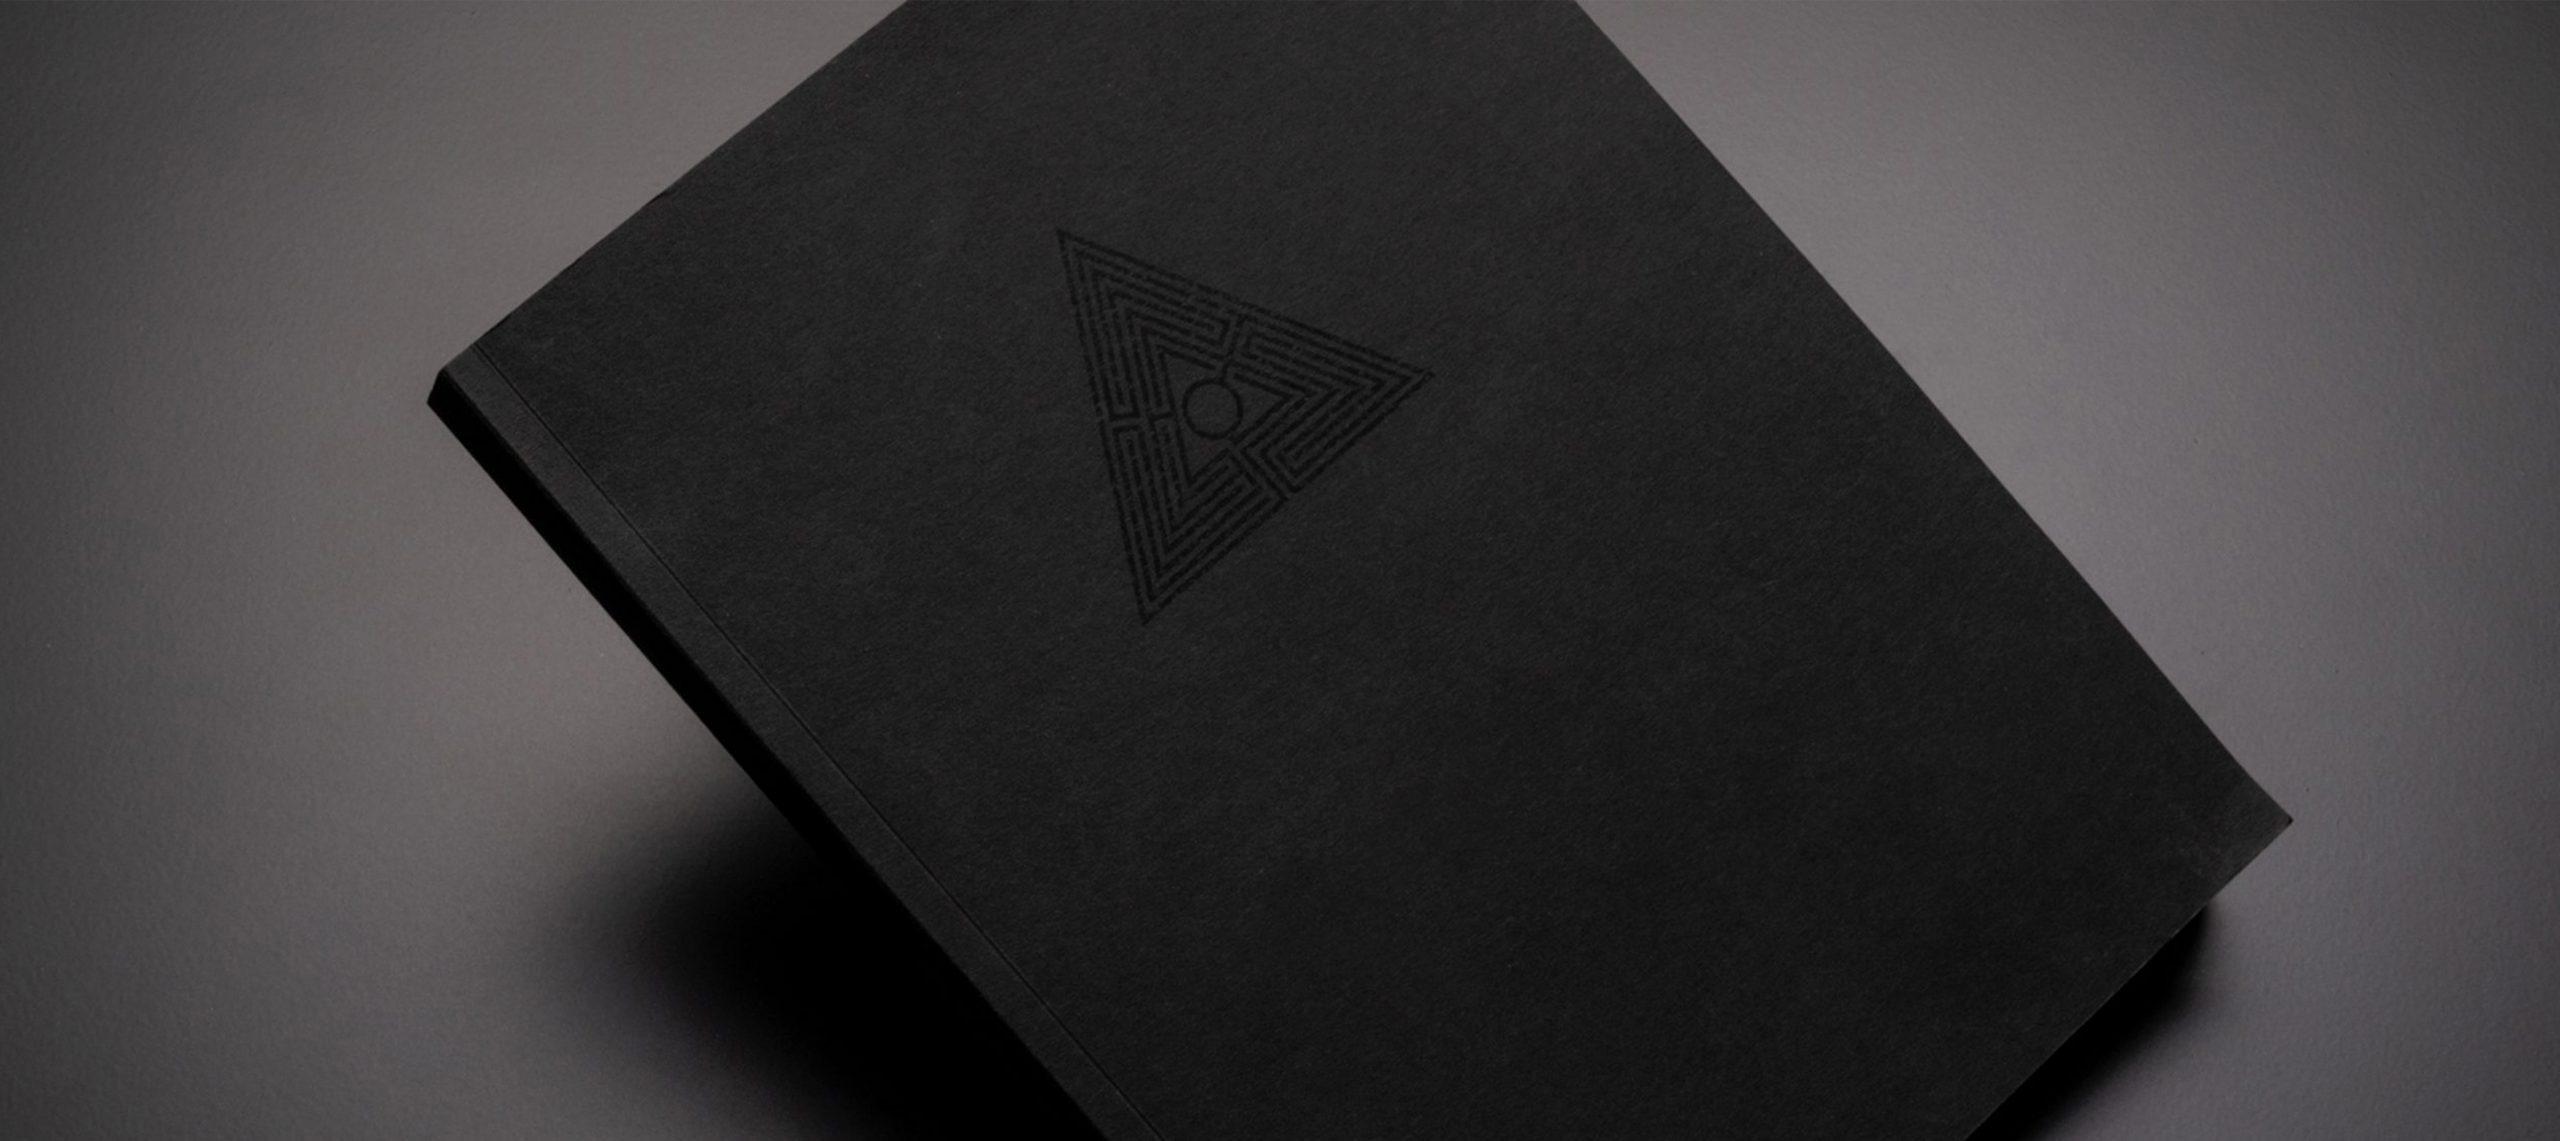 Studio Last - Secret Societies – Printed Matter